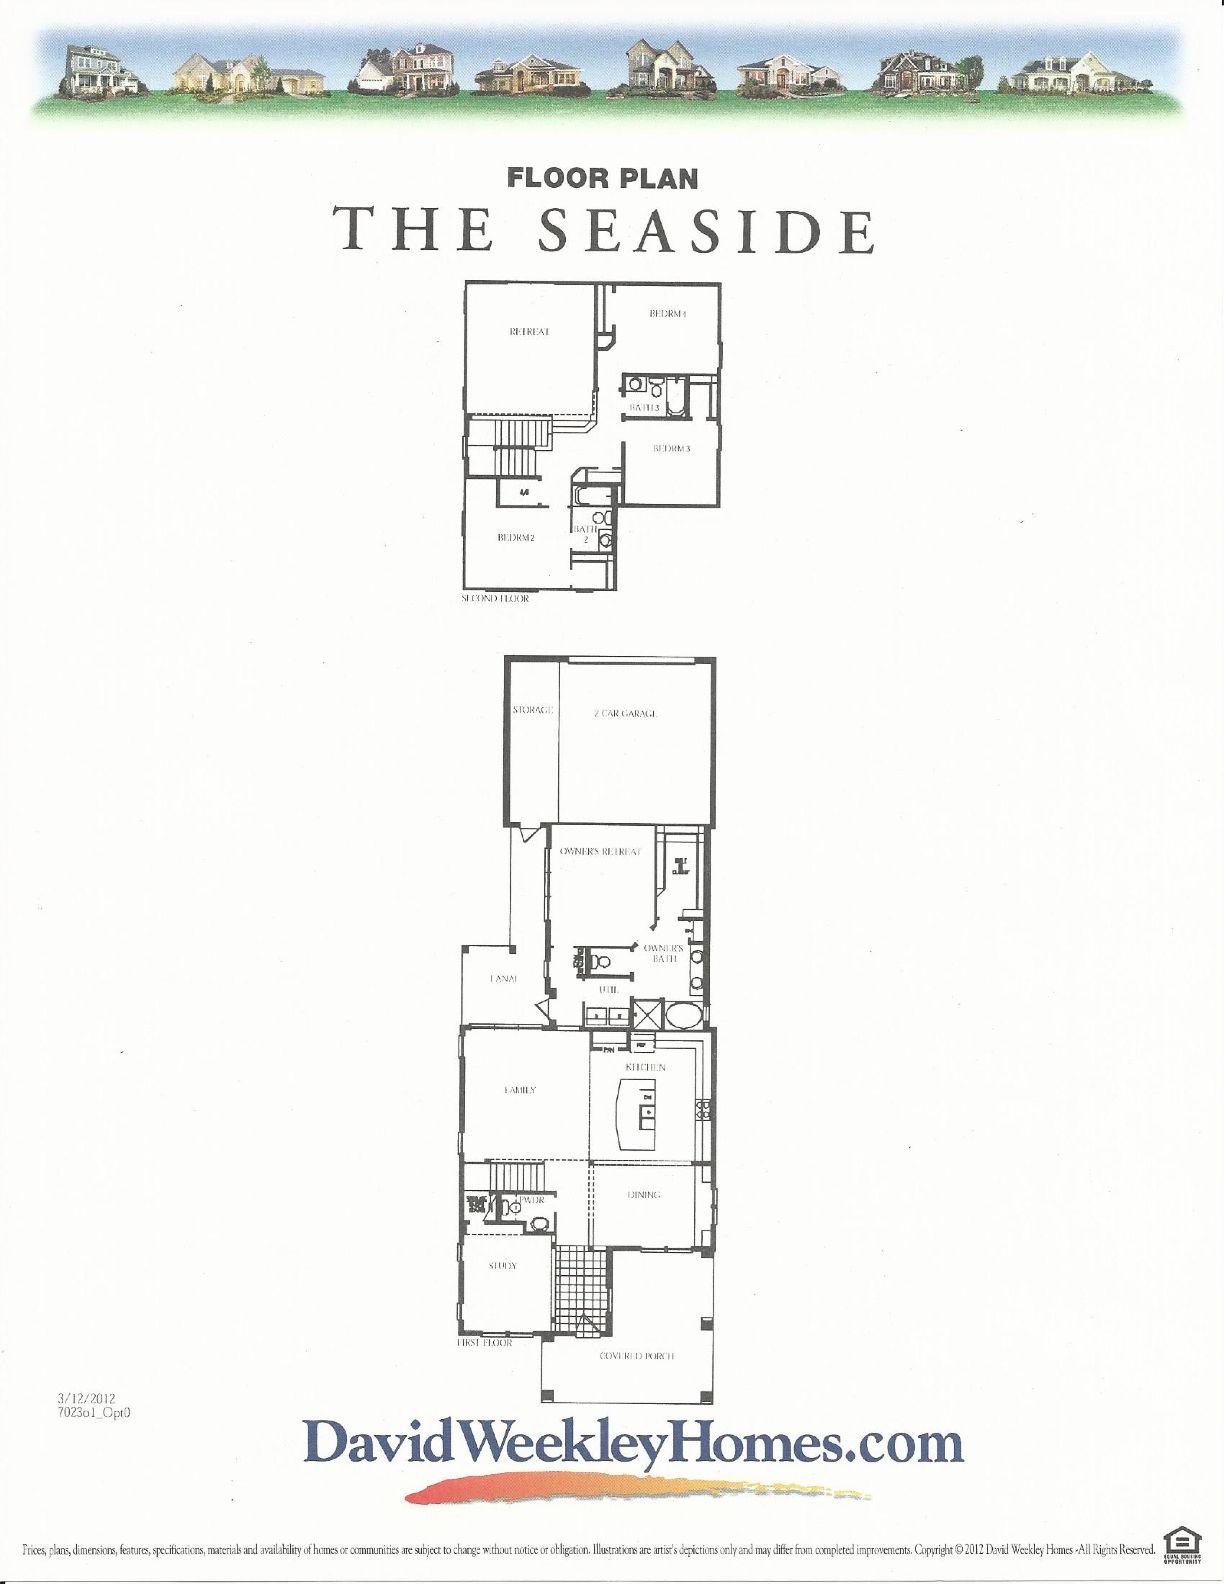 oakland park seaside floor plan 1 in winter garden fl oakland